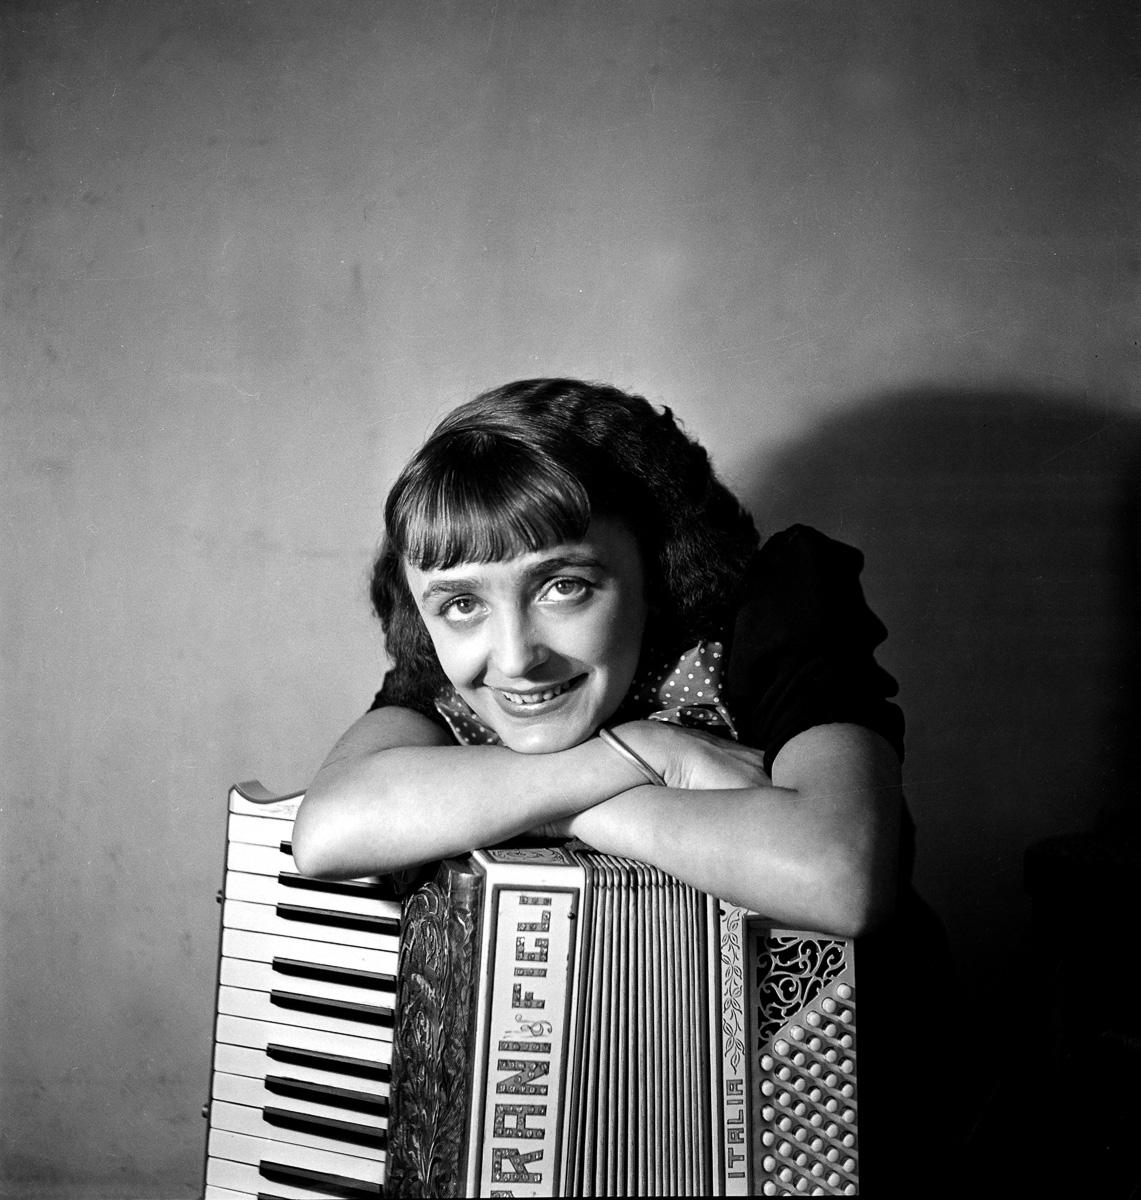 Edith Piaf (1915-1963), chanteuse française, 1936.